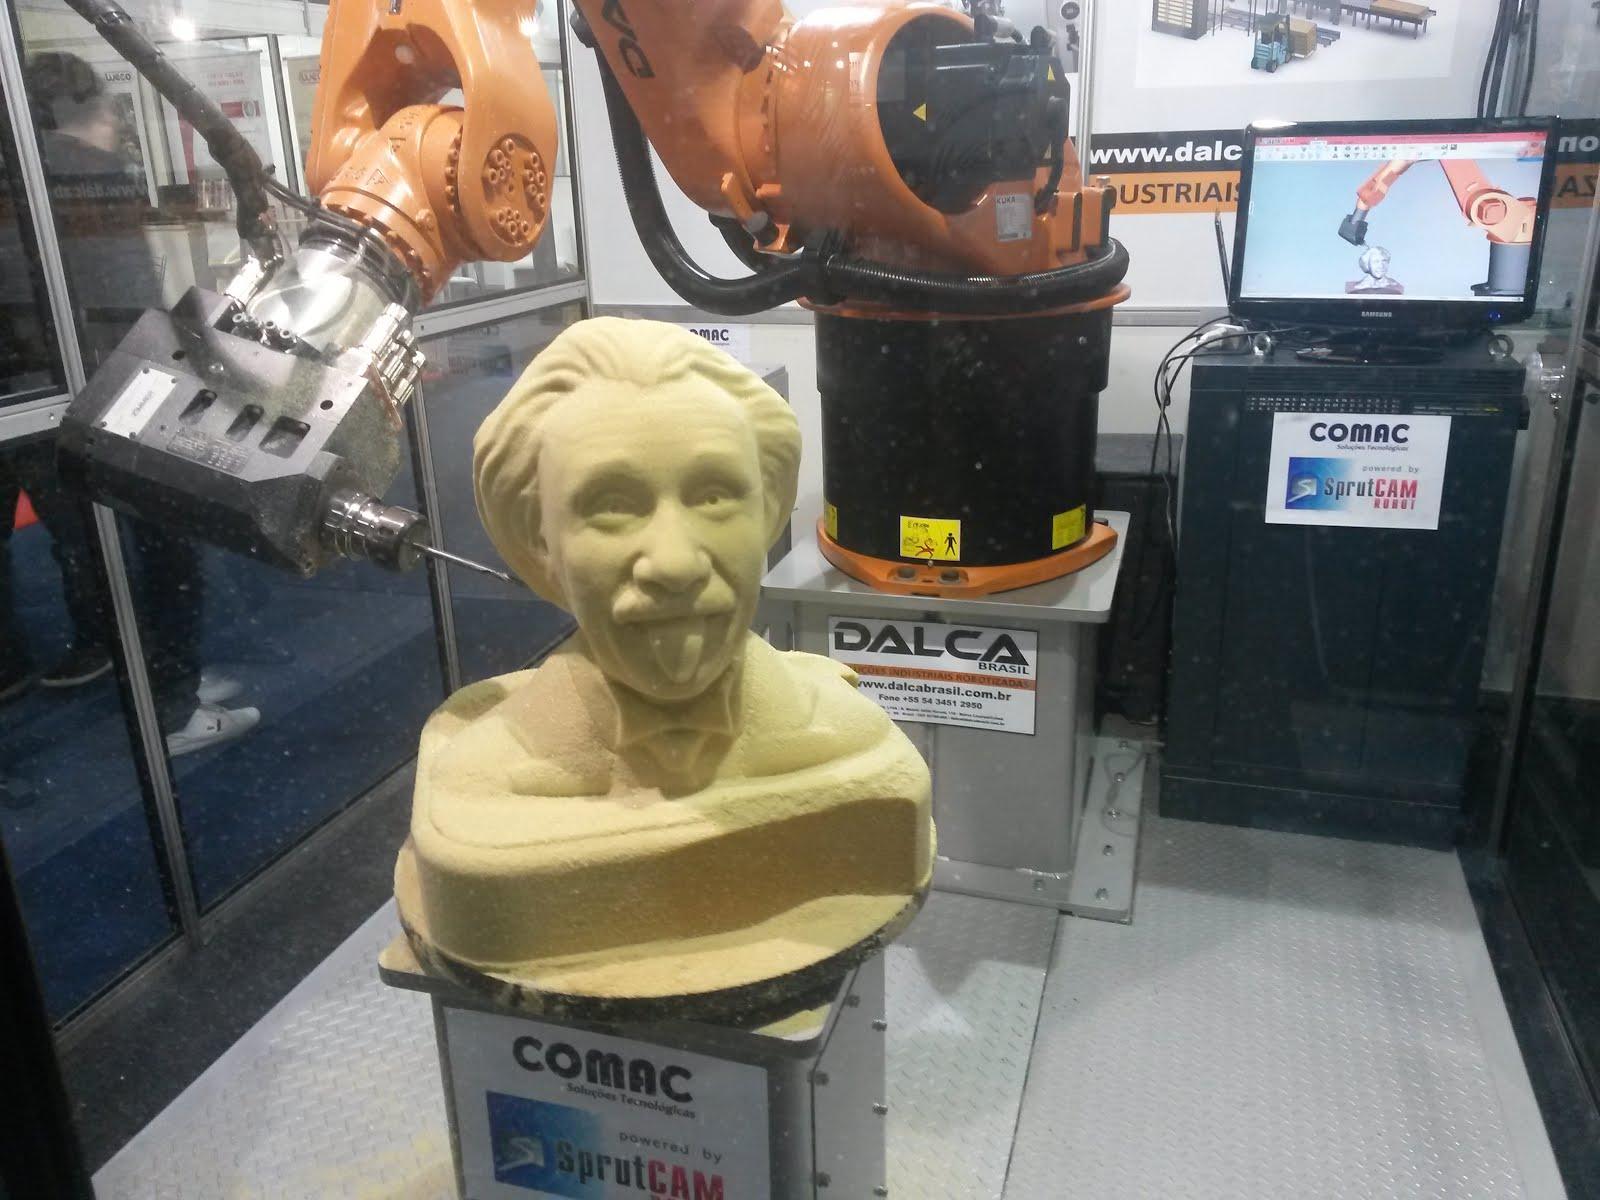 COMAC - SprutCAM BRASIL - Sistema CAD/CAM